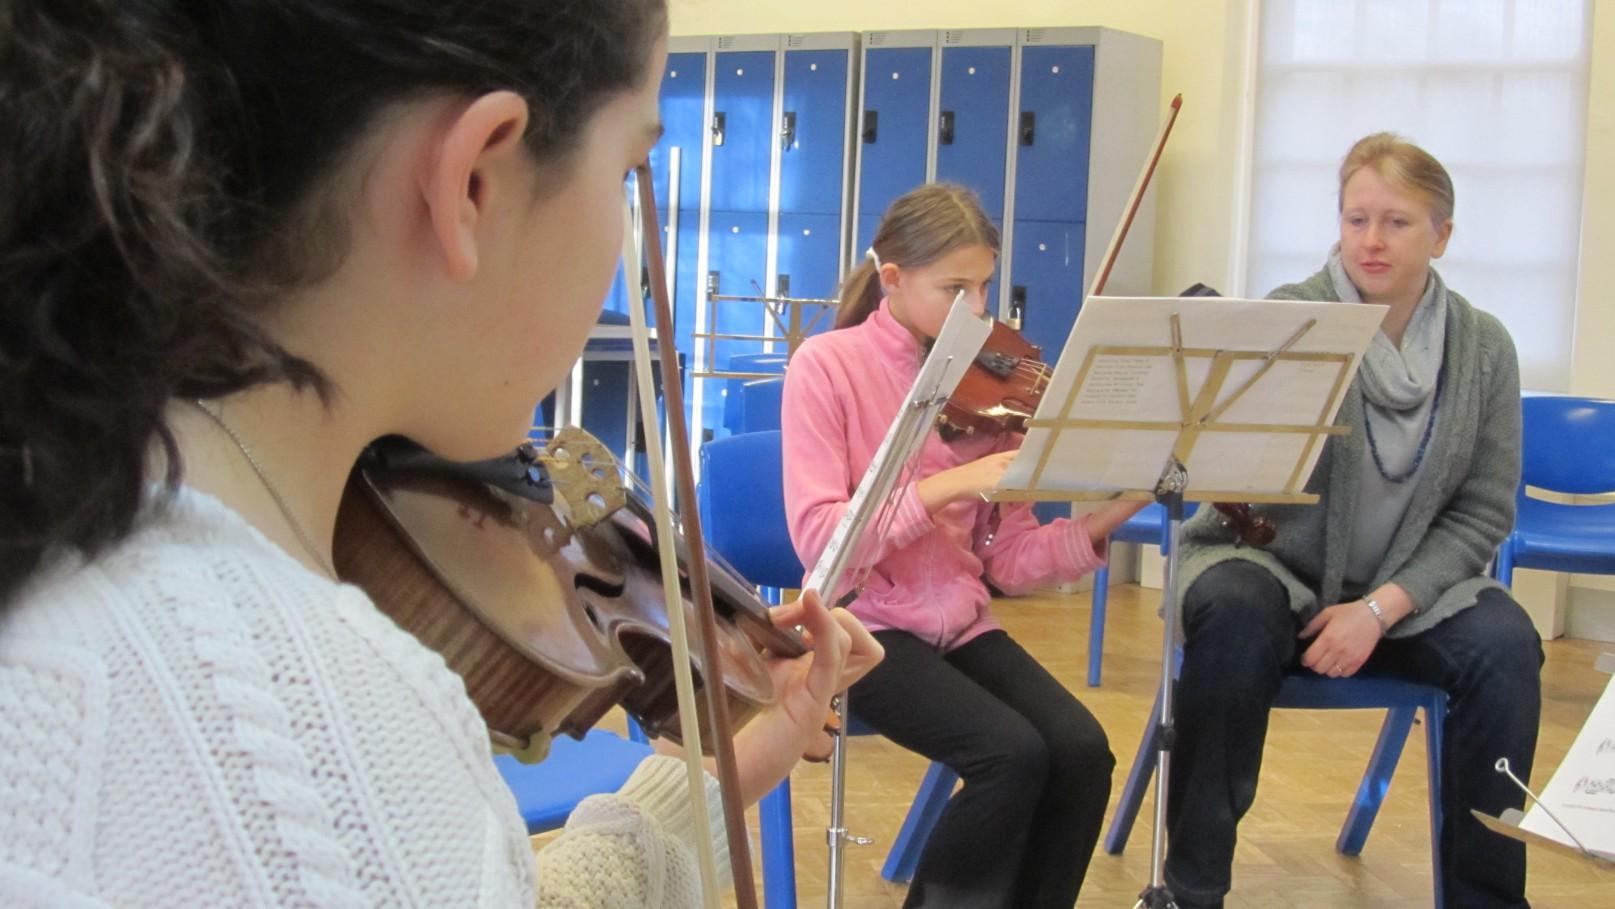 chamber ensemble at ymc with Fiona Nisbitt -01 05